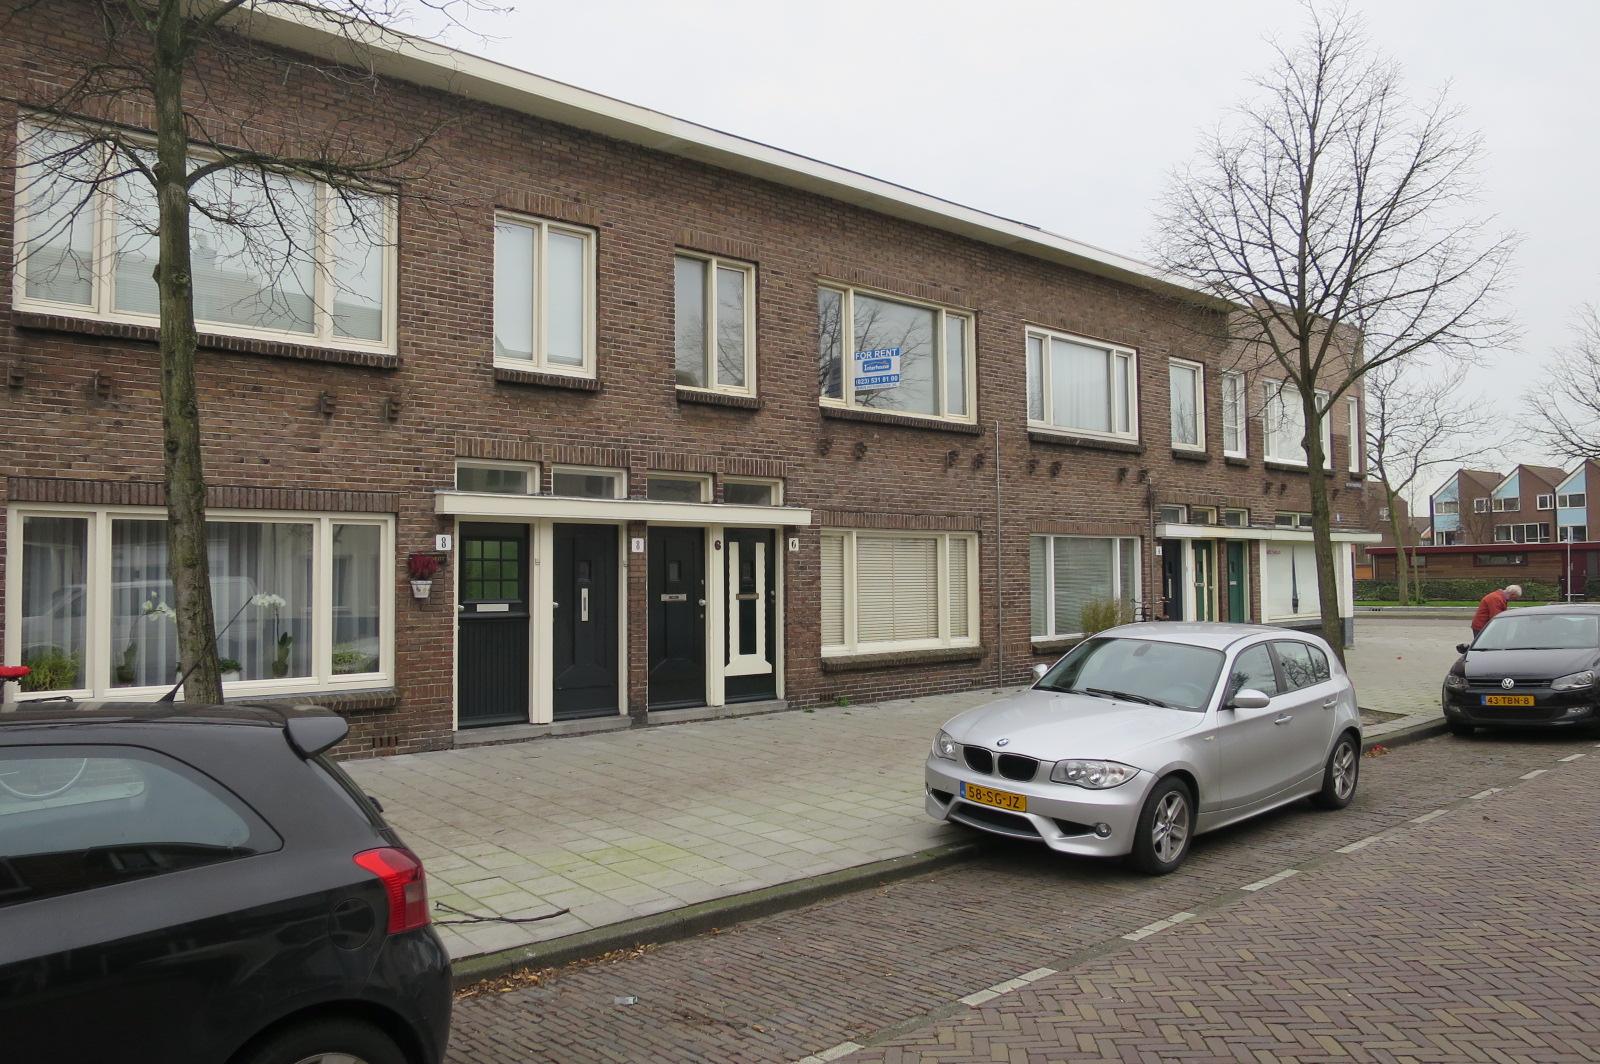 Byzantiumstraat, Haarlem